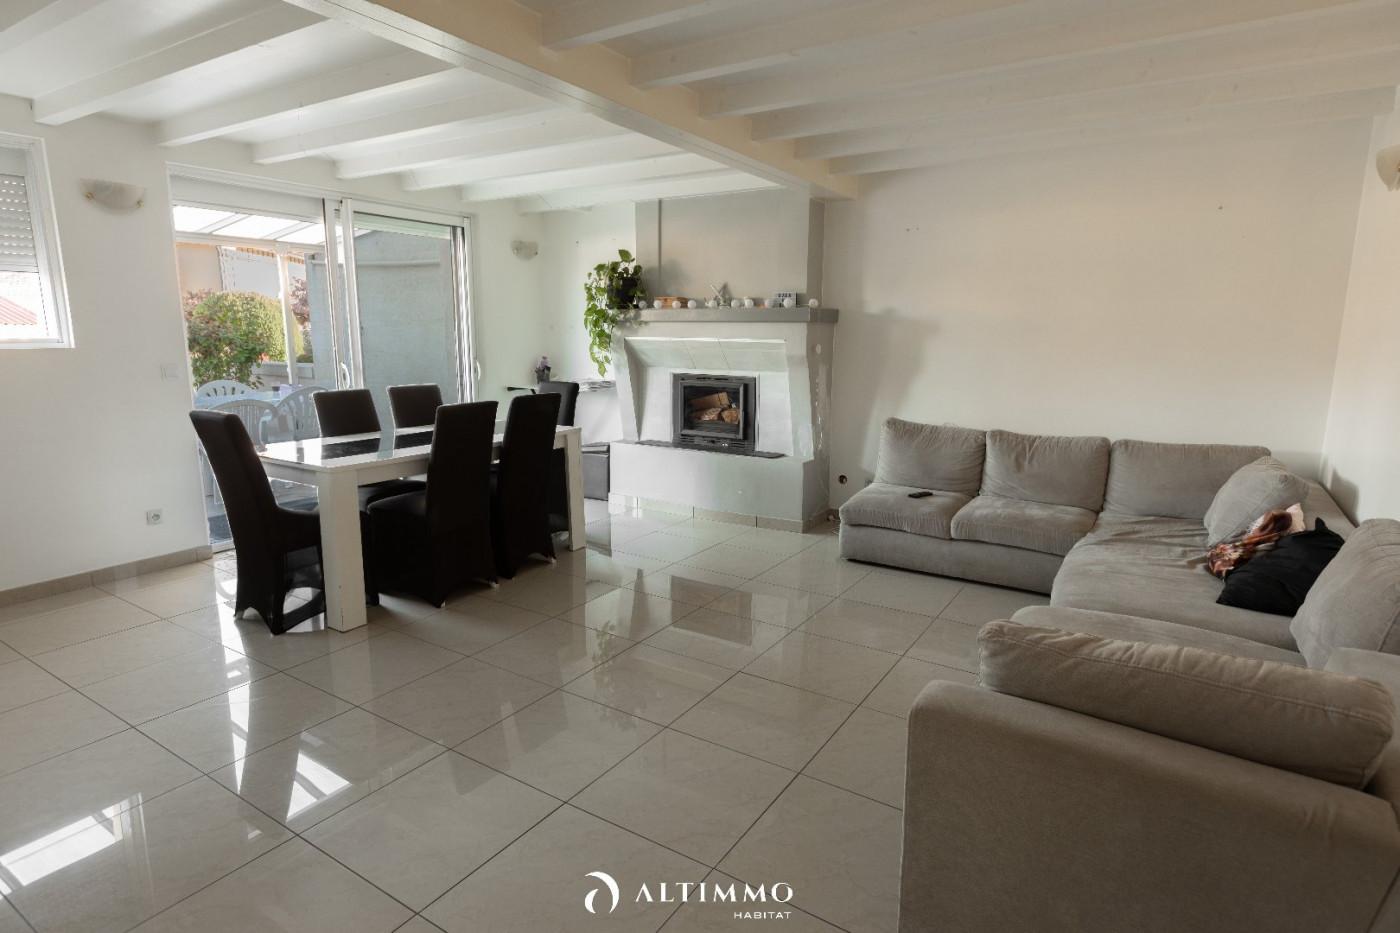 A vendre Ambares Et Lagrave 3453410745 Altimmo habitat